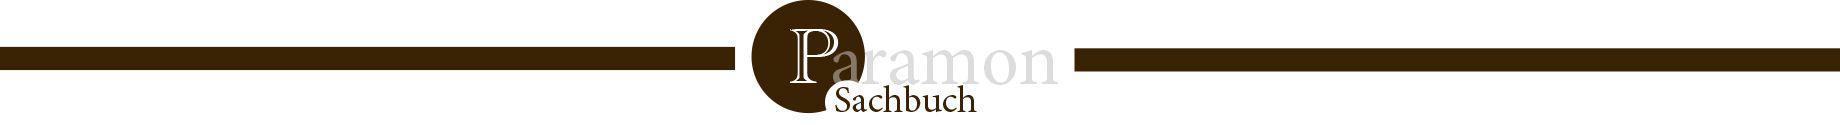 Sachbuch-Verlag-Paramon